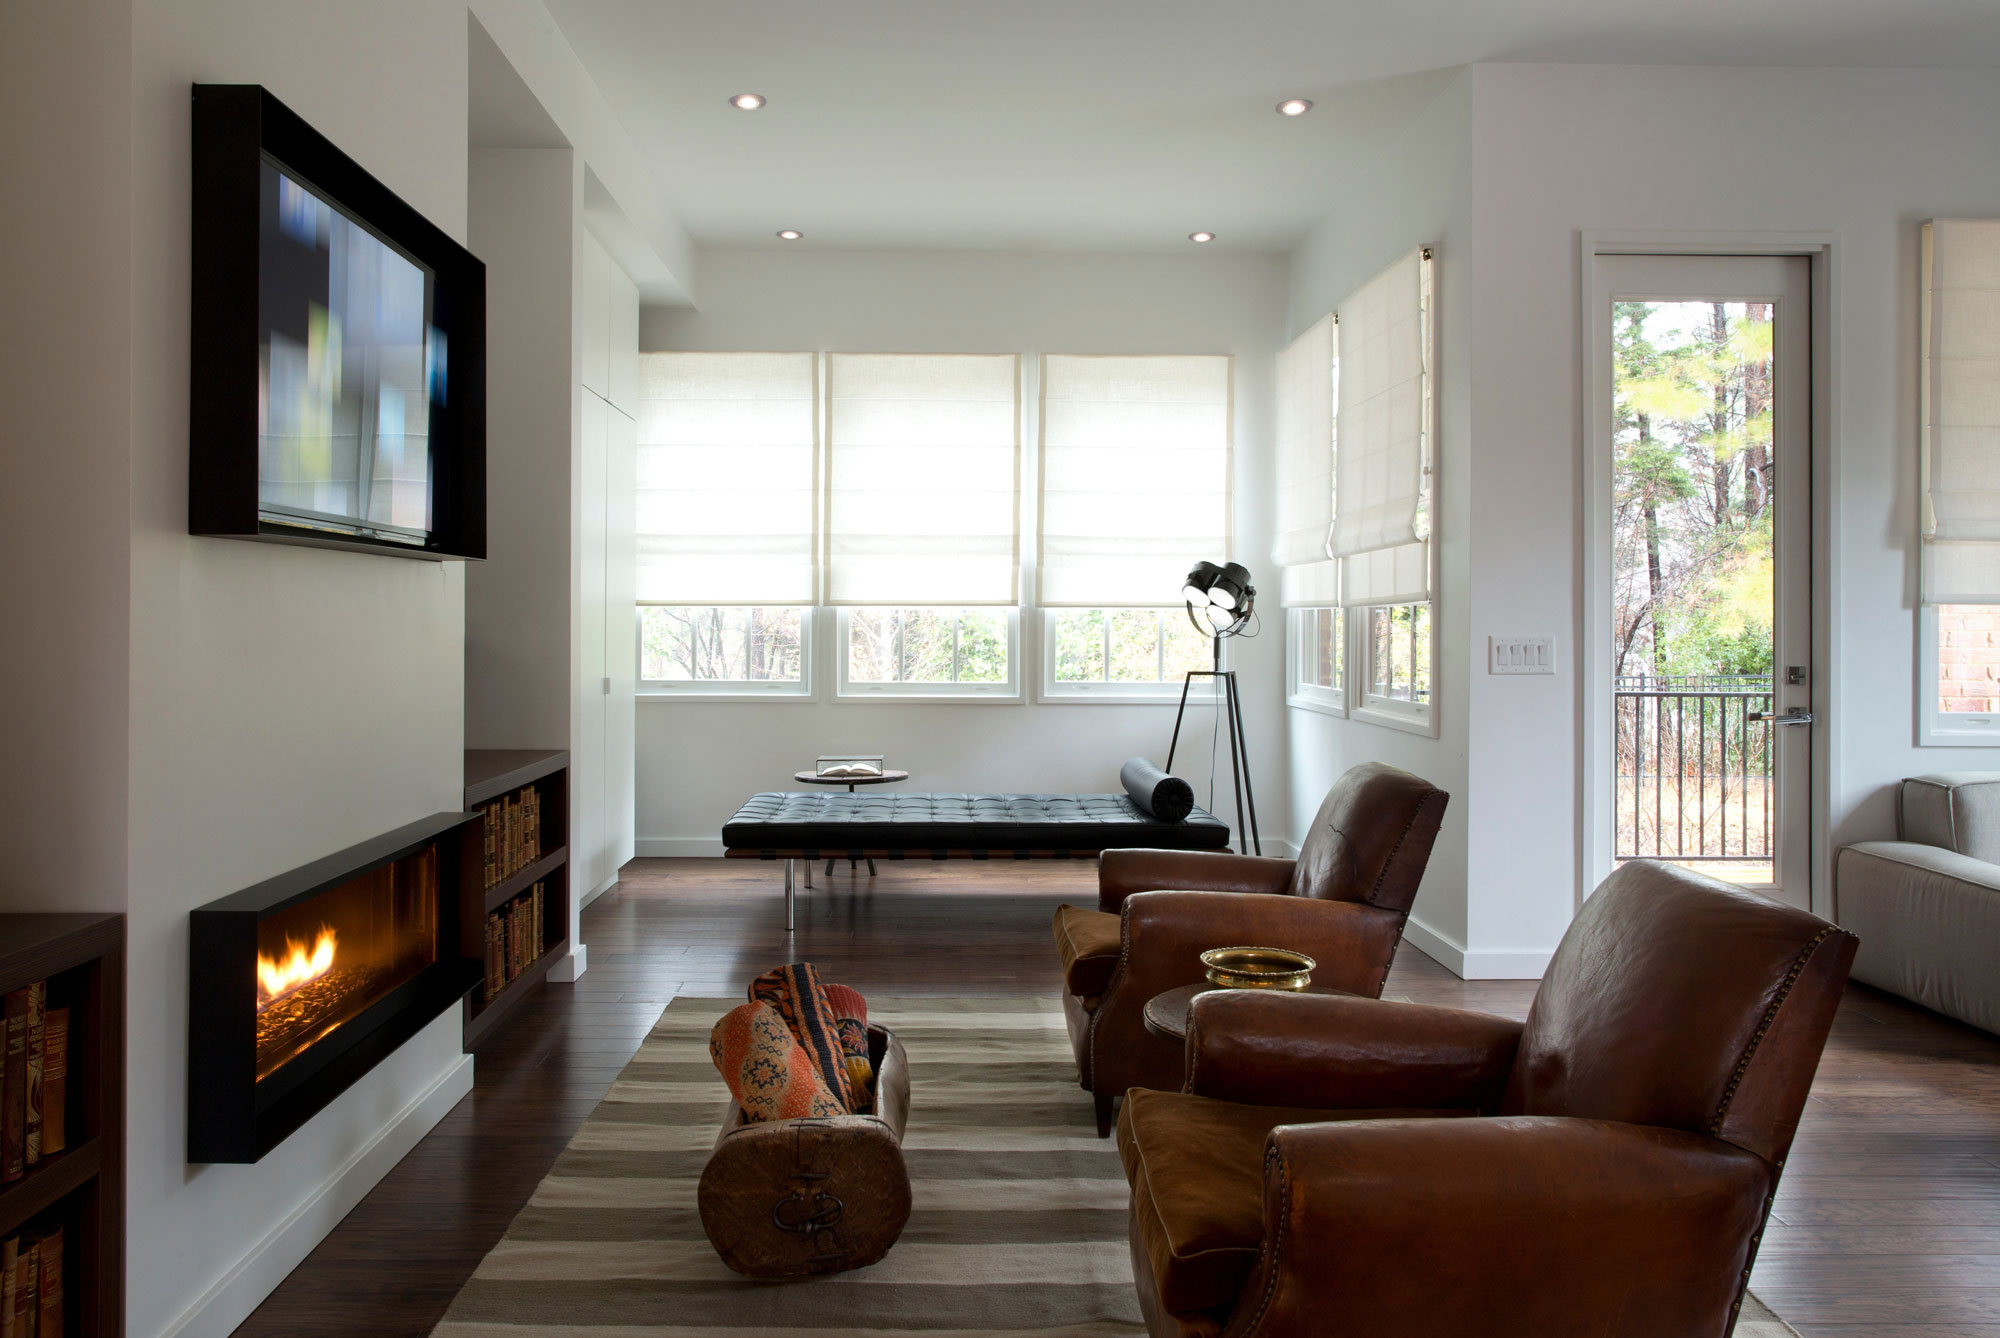 Chic Oglethorpe Home in Atlanta by Cecconi Simone-05